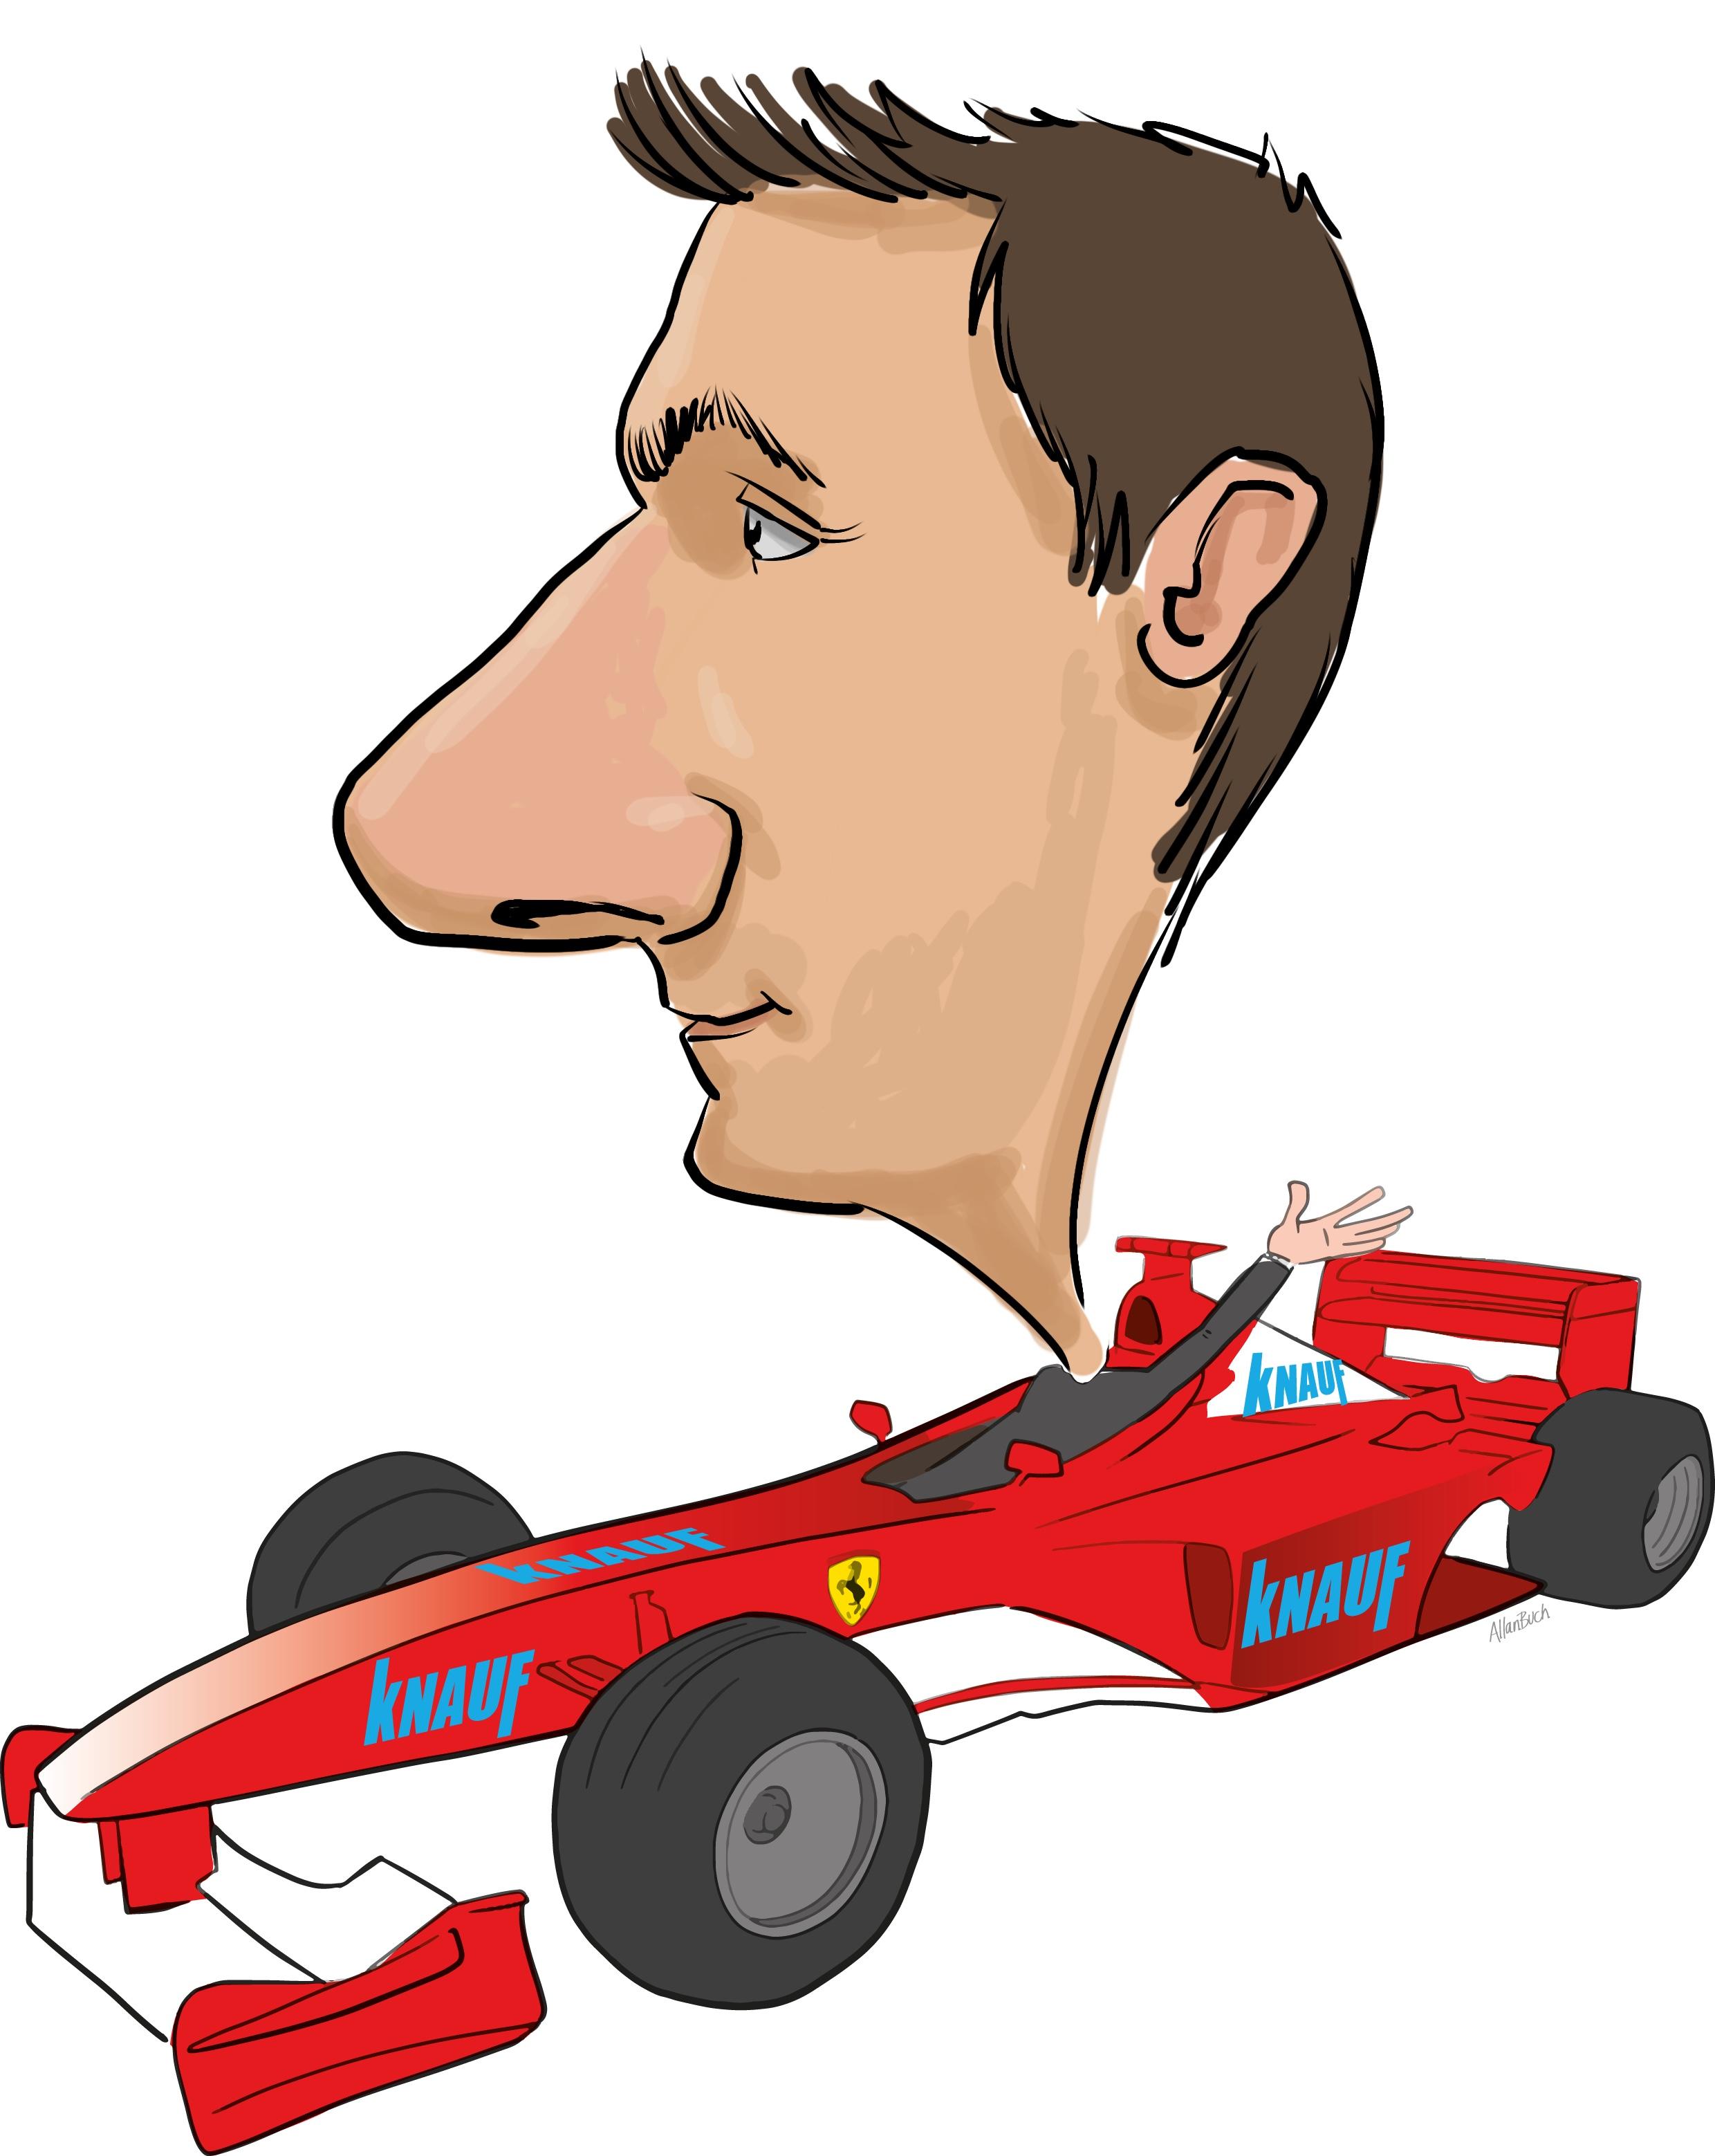 ipad Live karikatur med Allan Buch. farve profiltegning3